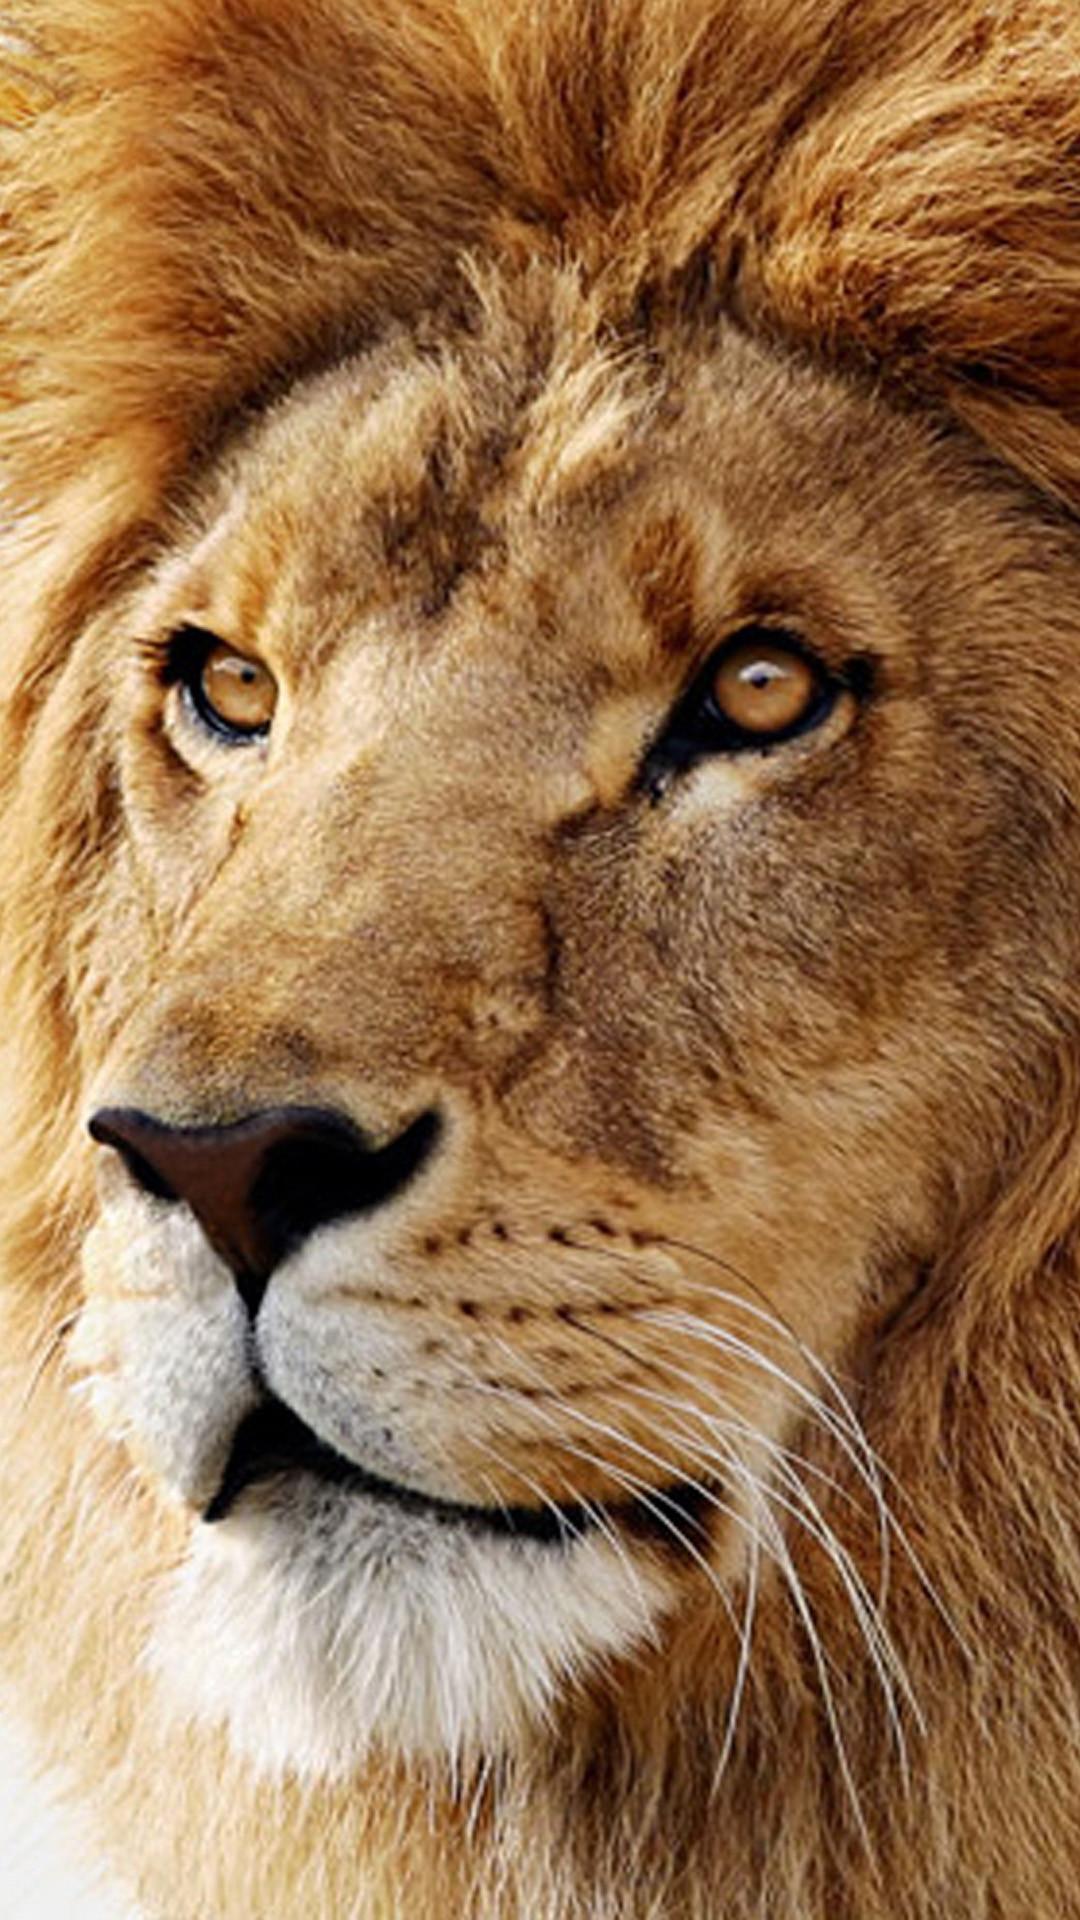 Mac os x lion Samsung Galaxy S5 Wallpapers.jpg